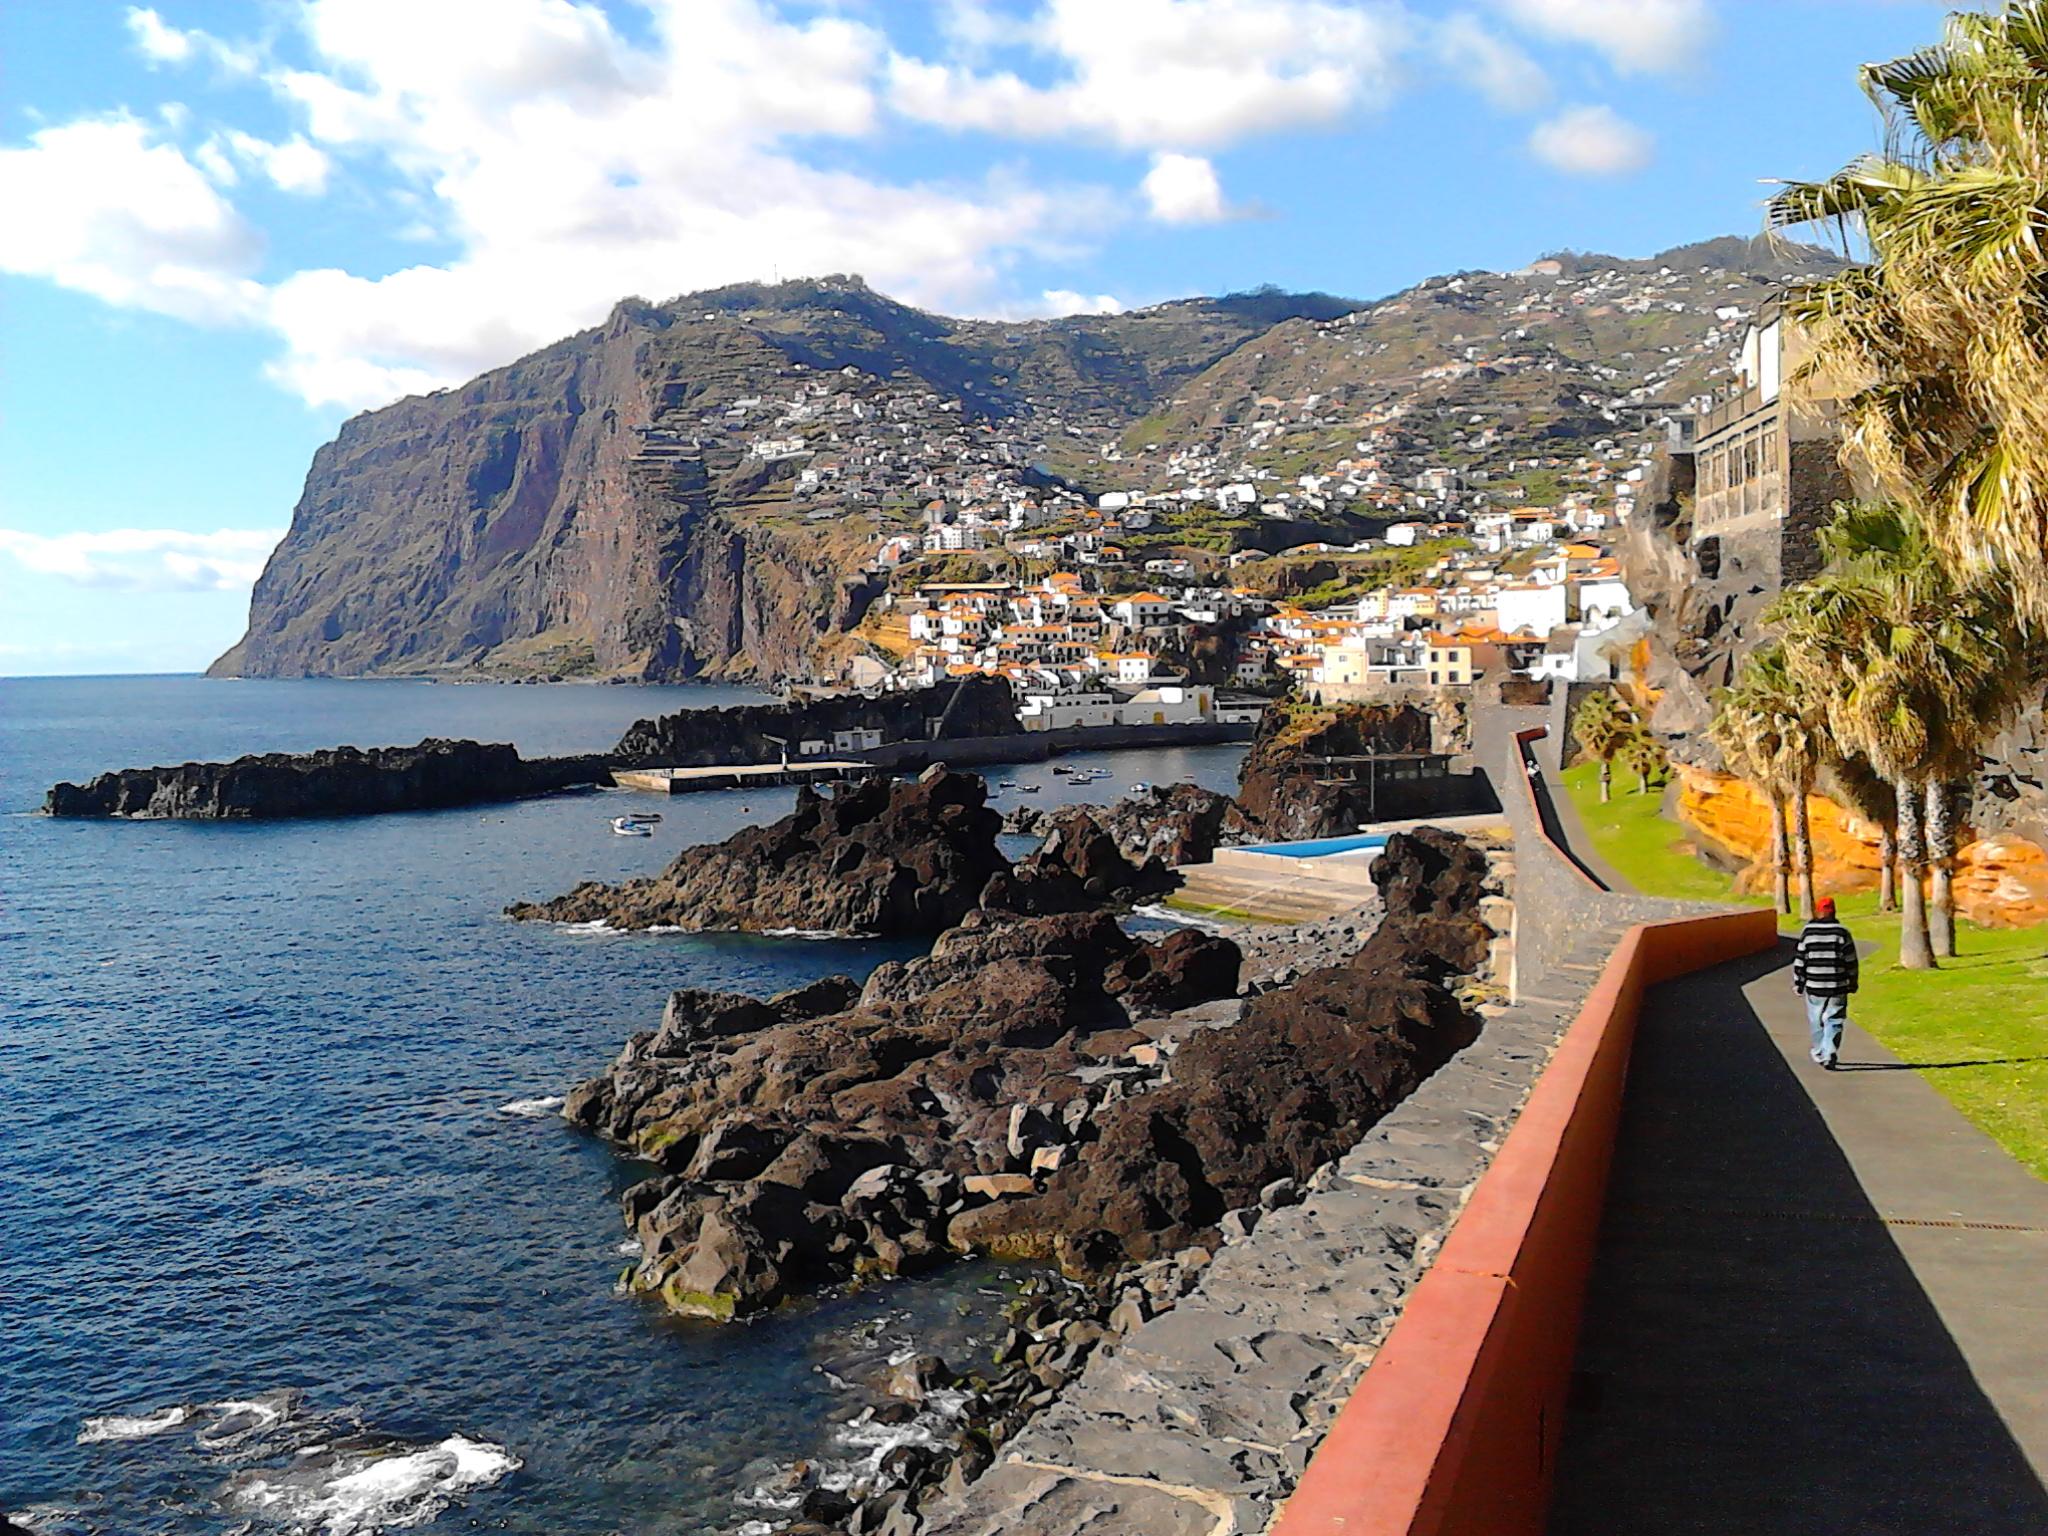 L'isola di Madeira